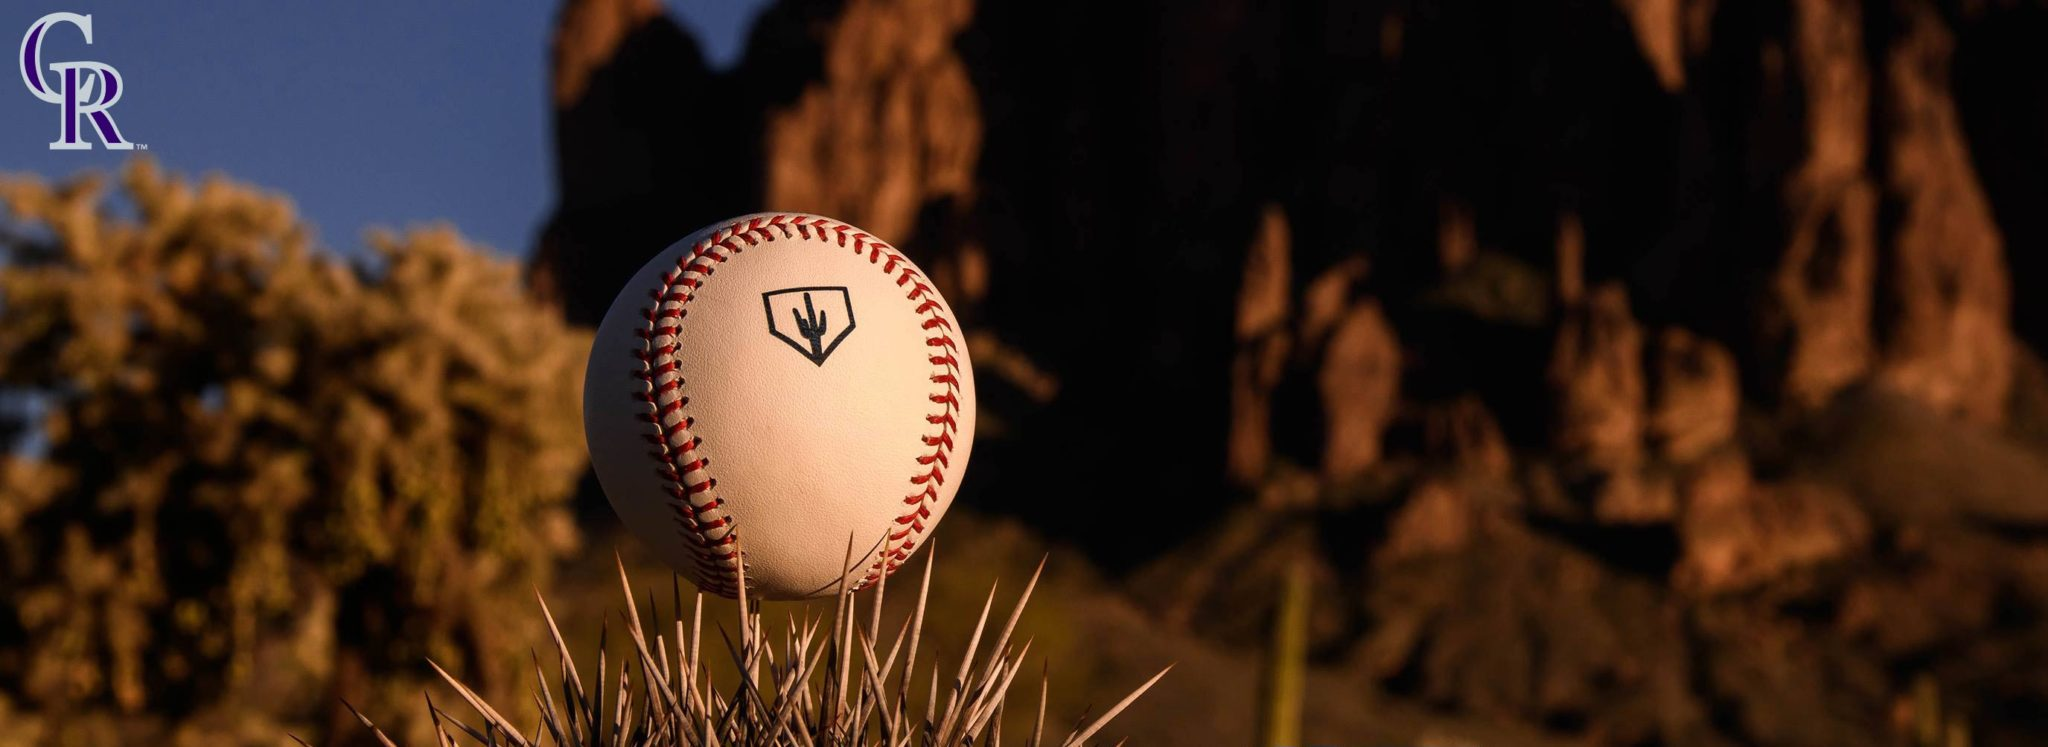 Rockies Spring Training Baseball - Arizona